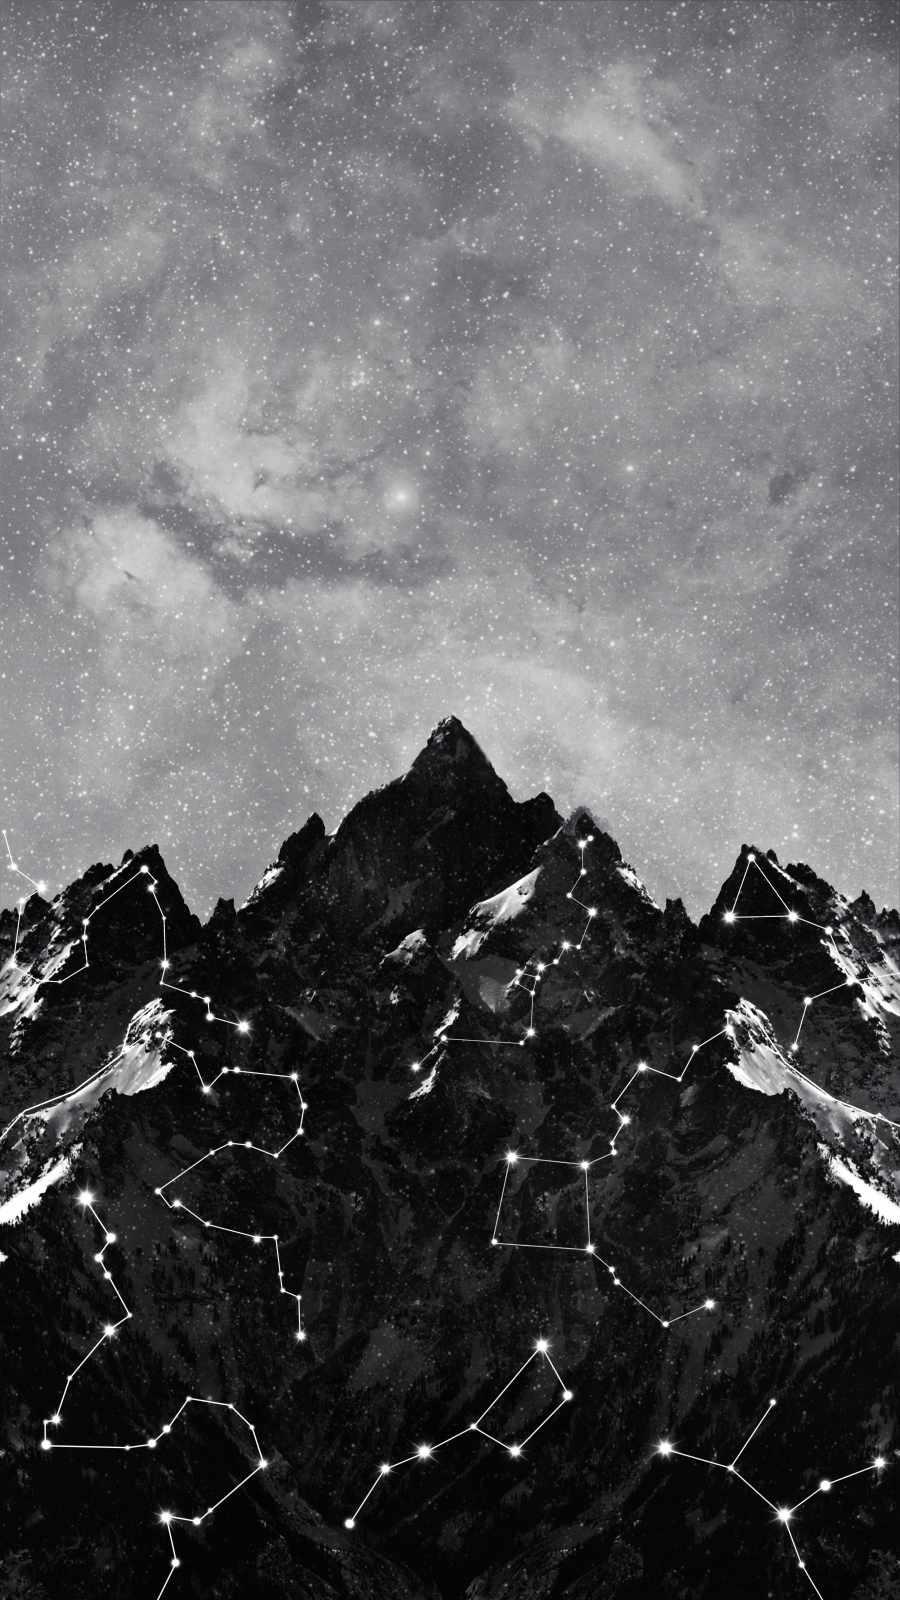 Mountain Star map